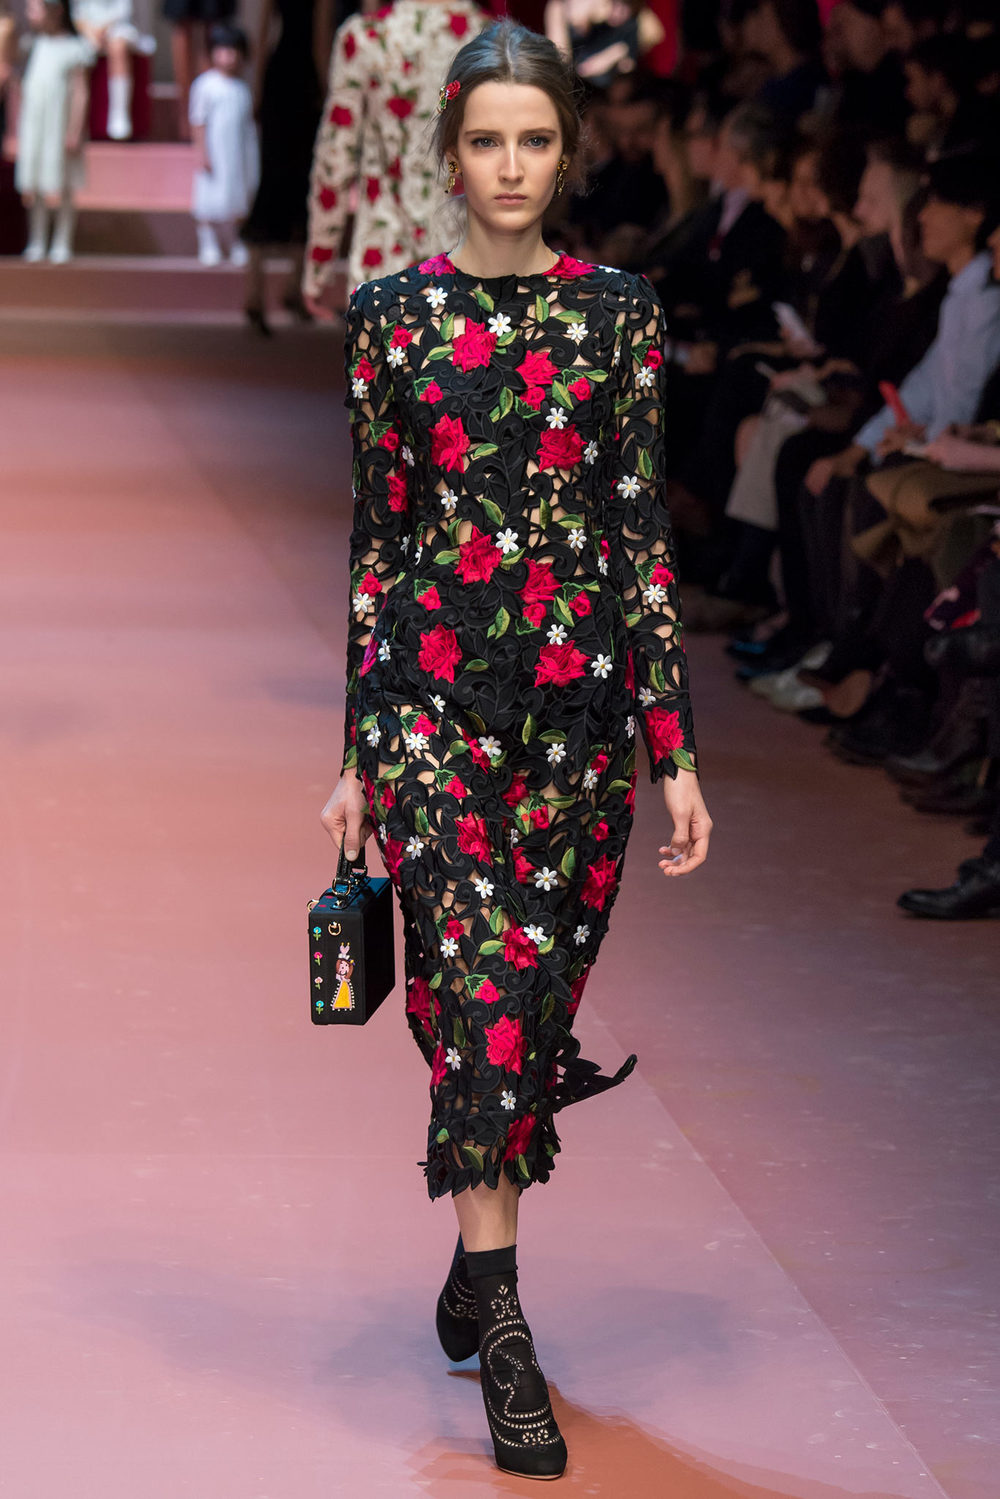 dol rose dress cute purse.jpg